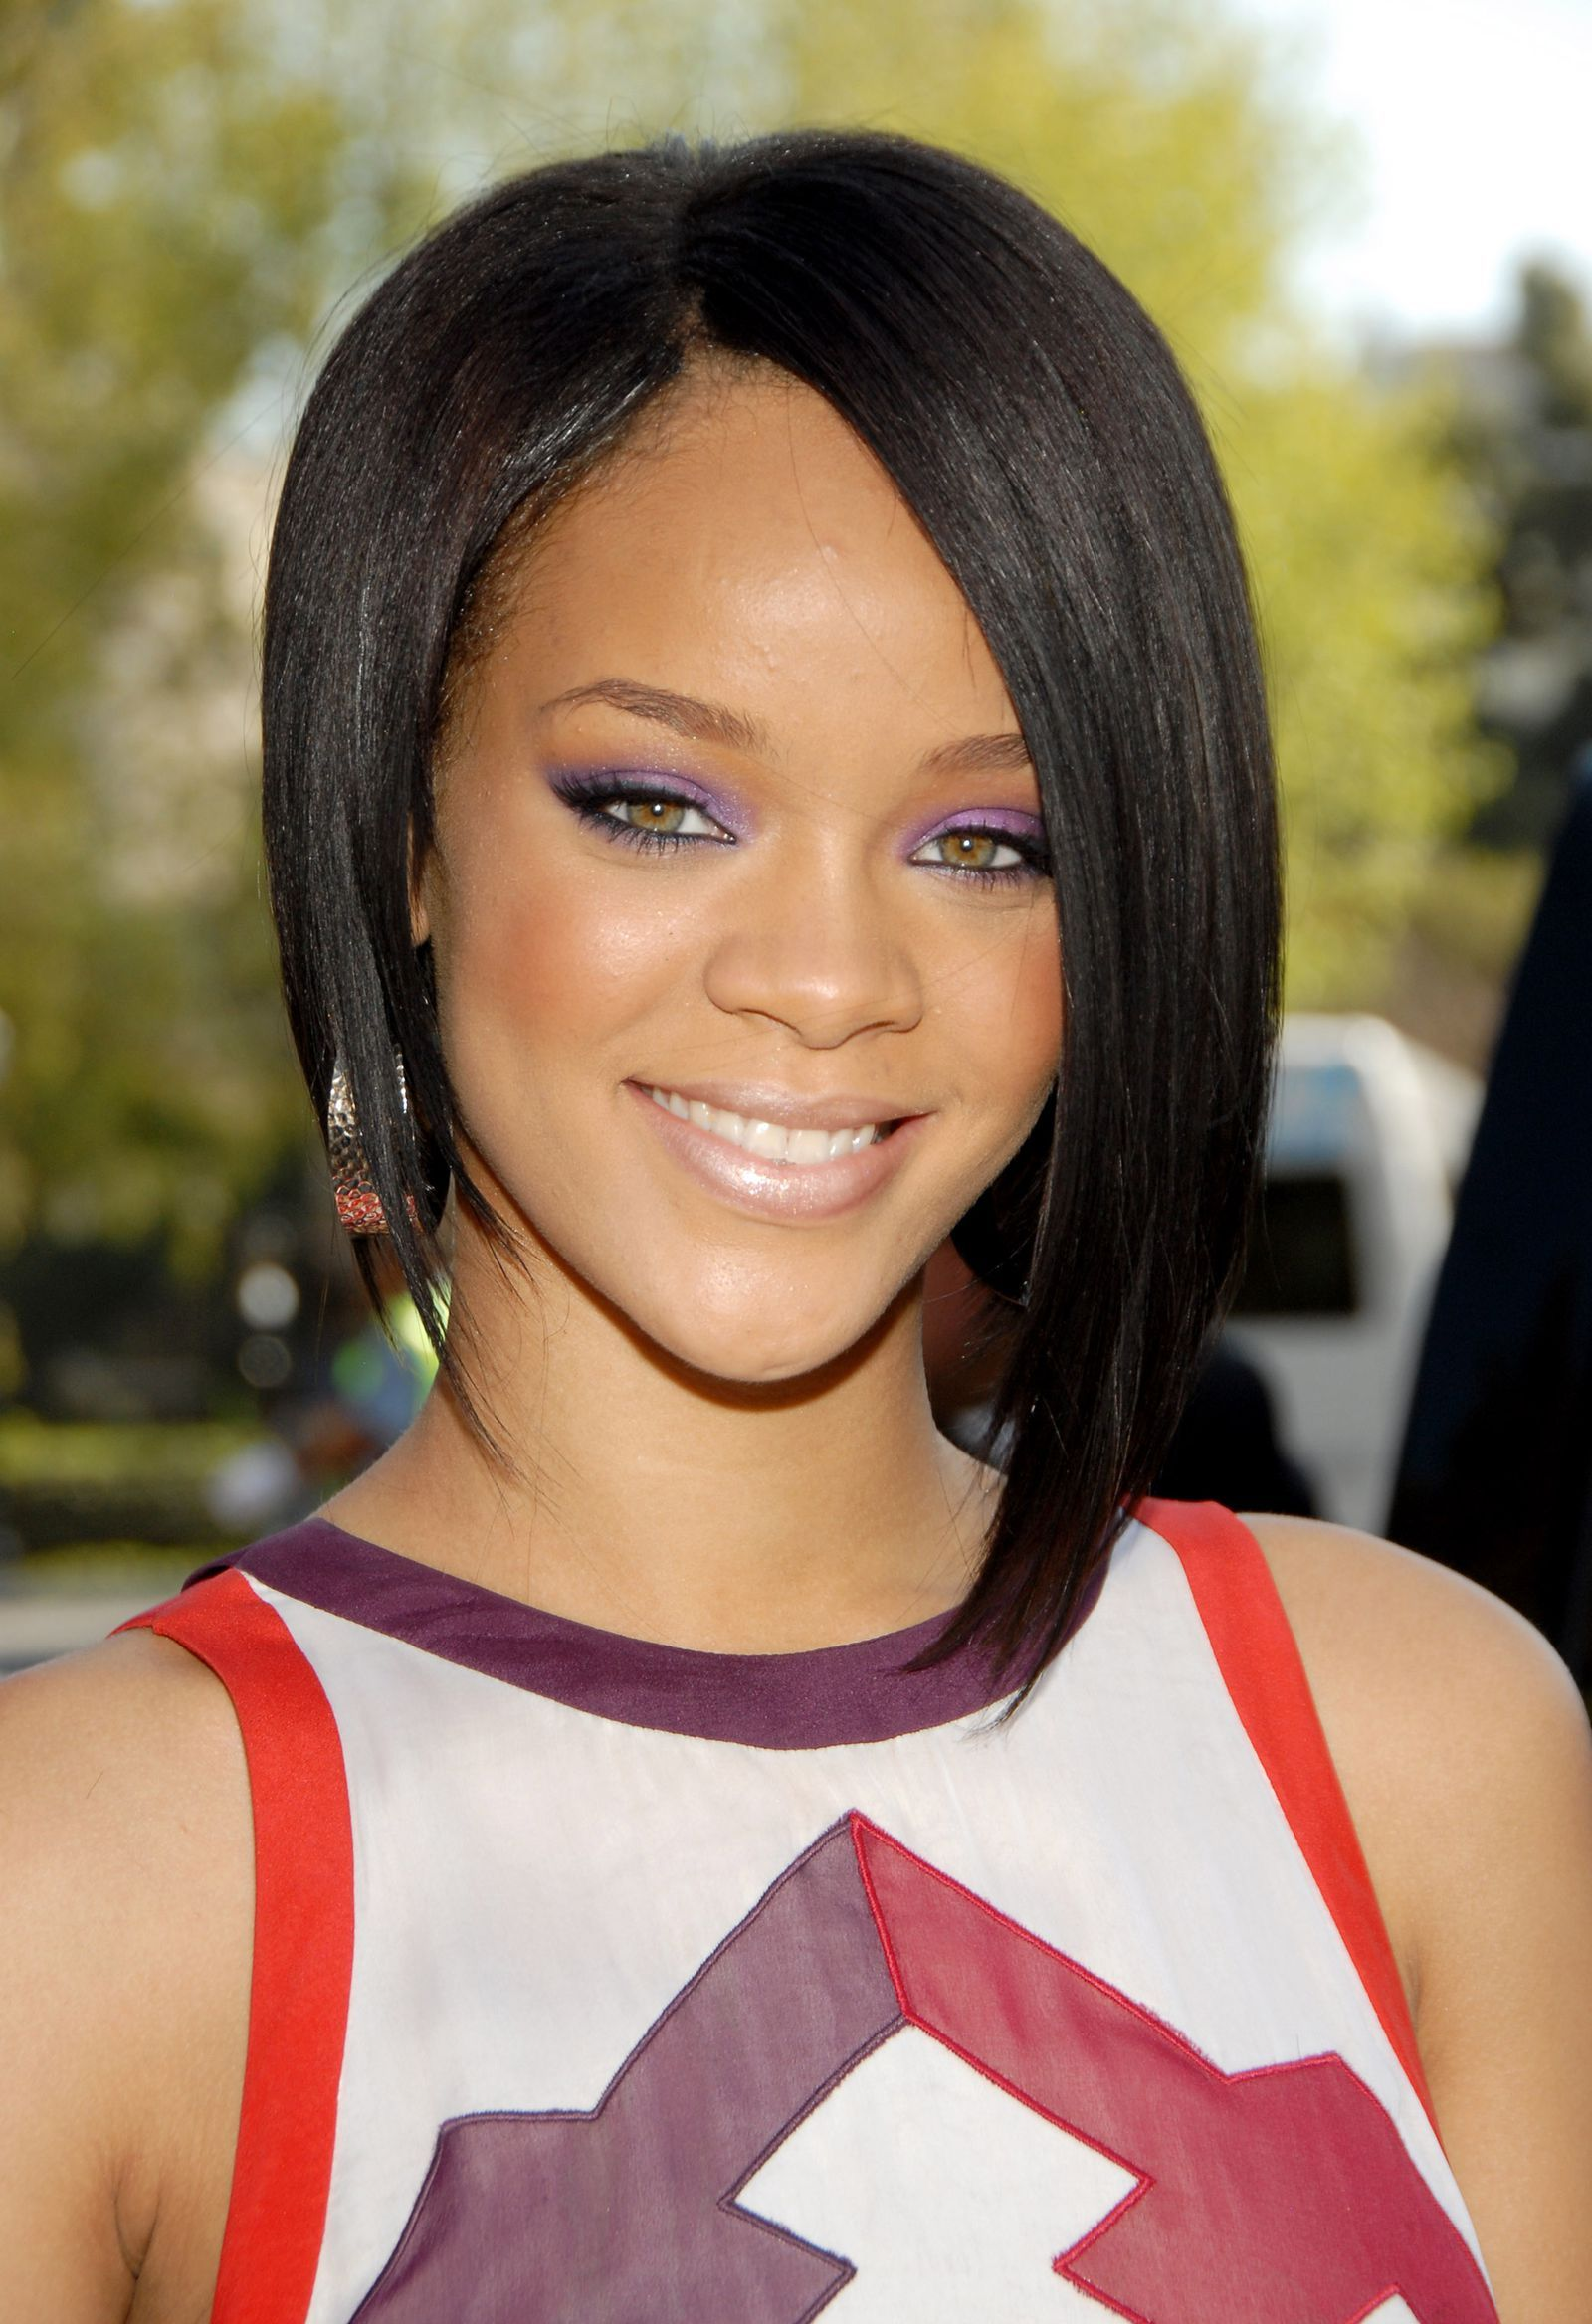 25 Best Rihanna Short Hair Styles - Fashion Icon to Follow ... |Dope Rihanna Haircuts